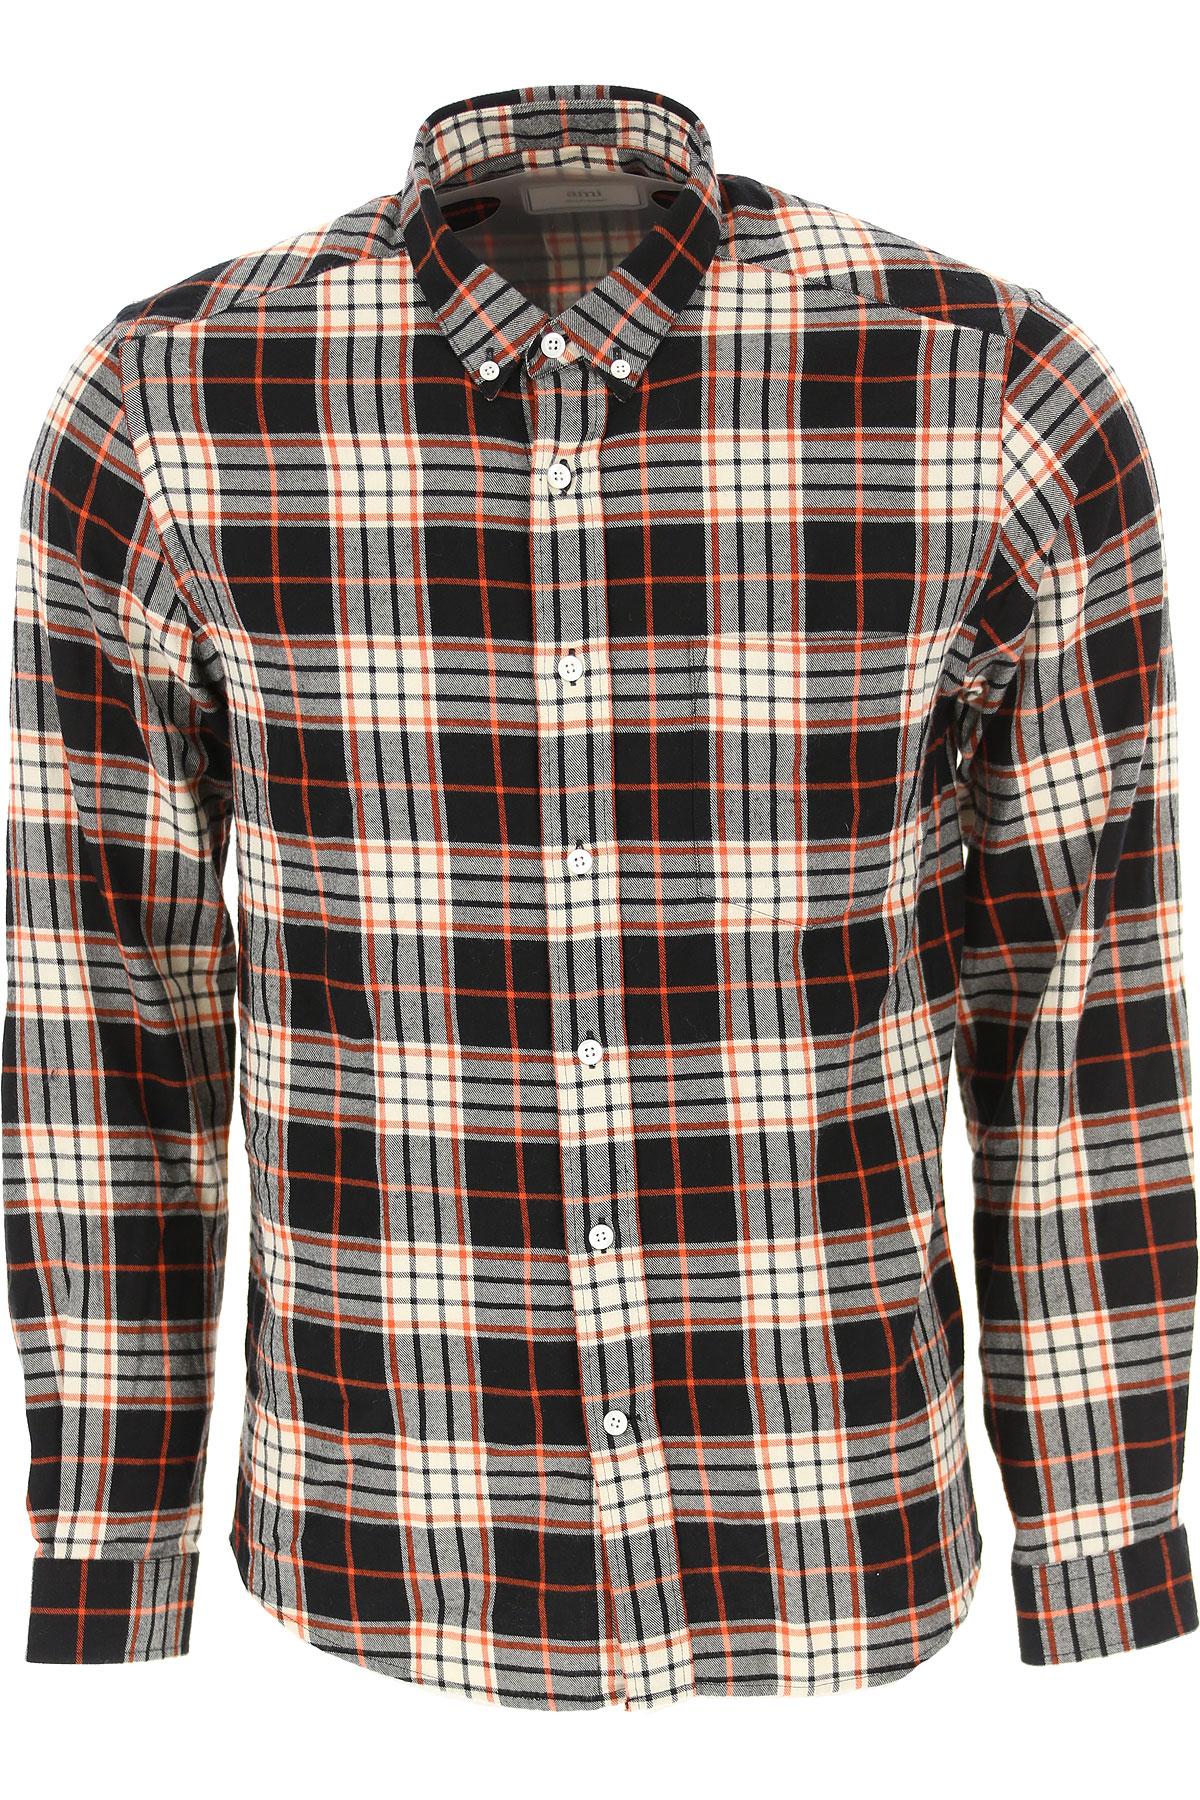 Ami Shirt for Men, Orange, Cotton, 2019, 15.5 15.75 16.5